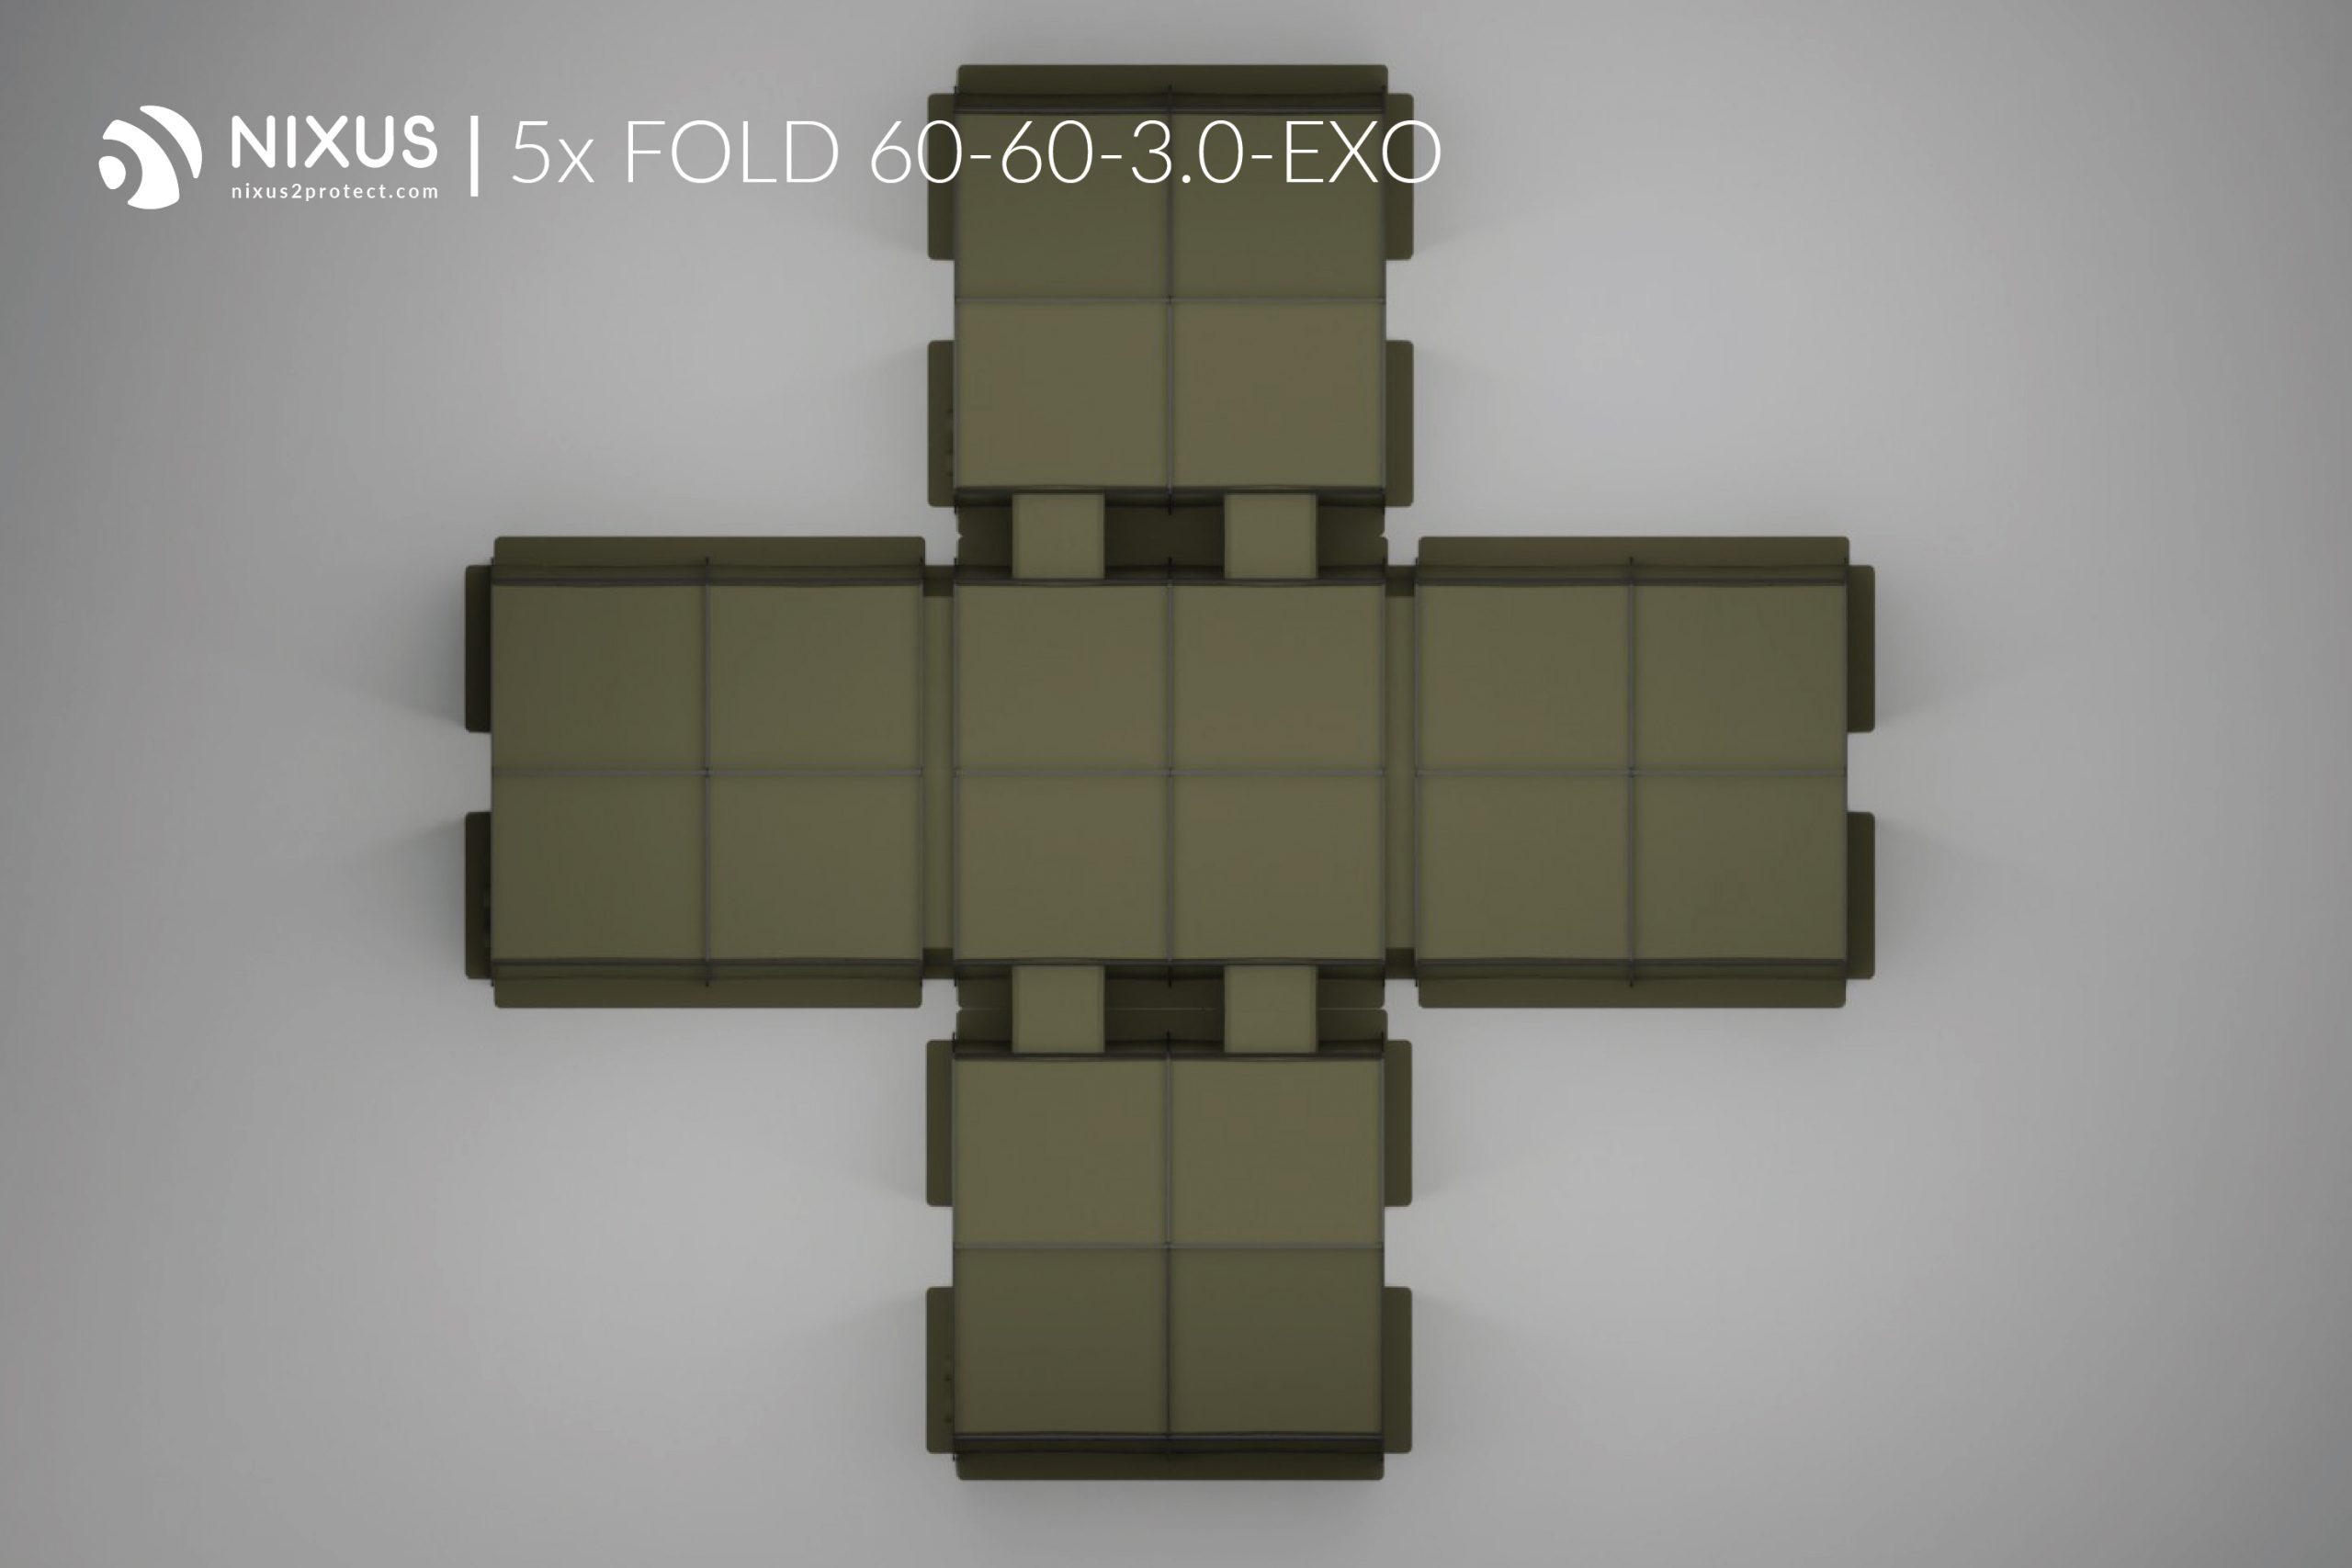 NIXUS PRO X Command Post - Inside View